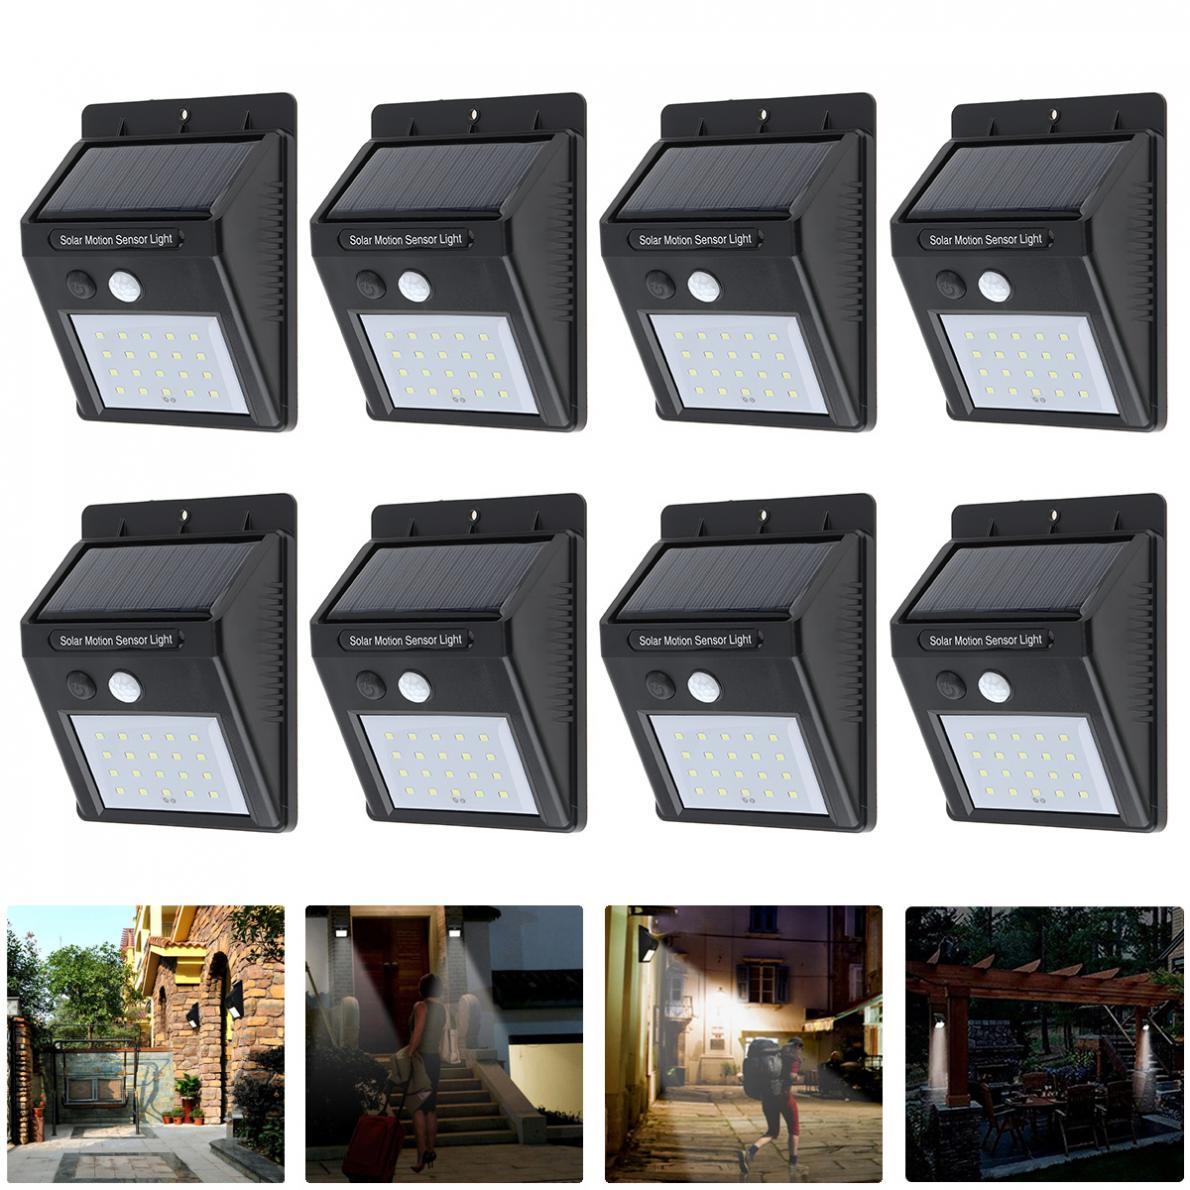 New 8pcs Outdoor Waterproof 20 LED Rechargeable Solar Power PIR Motion Sensor Wall Light for Garden / Yard / Driveway ds 360 solar sensor led light black